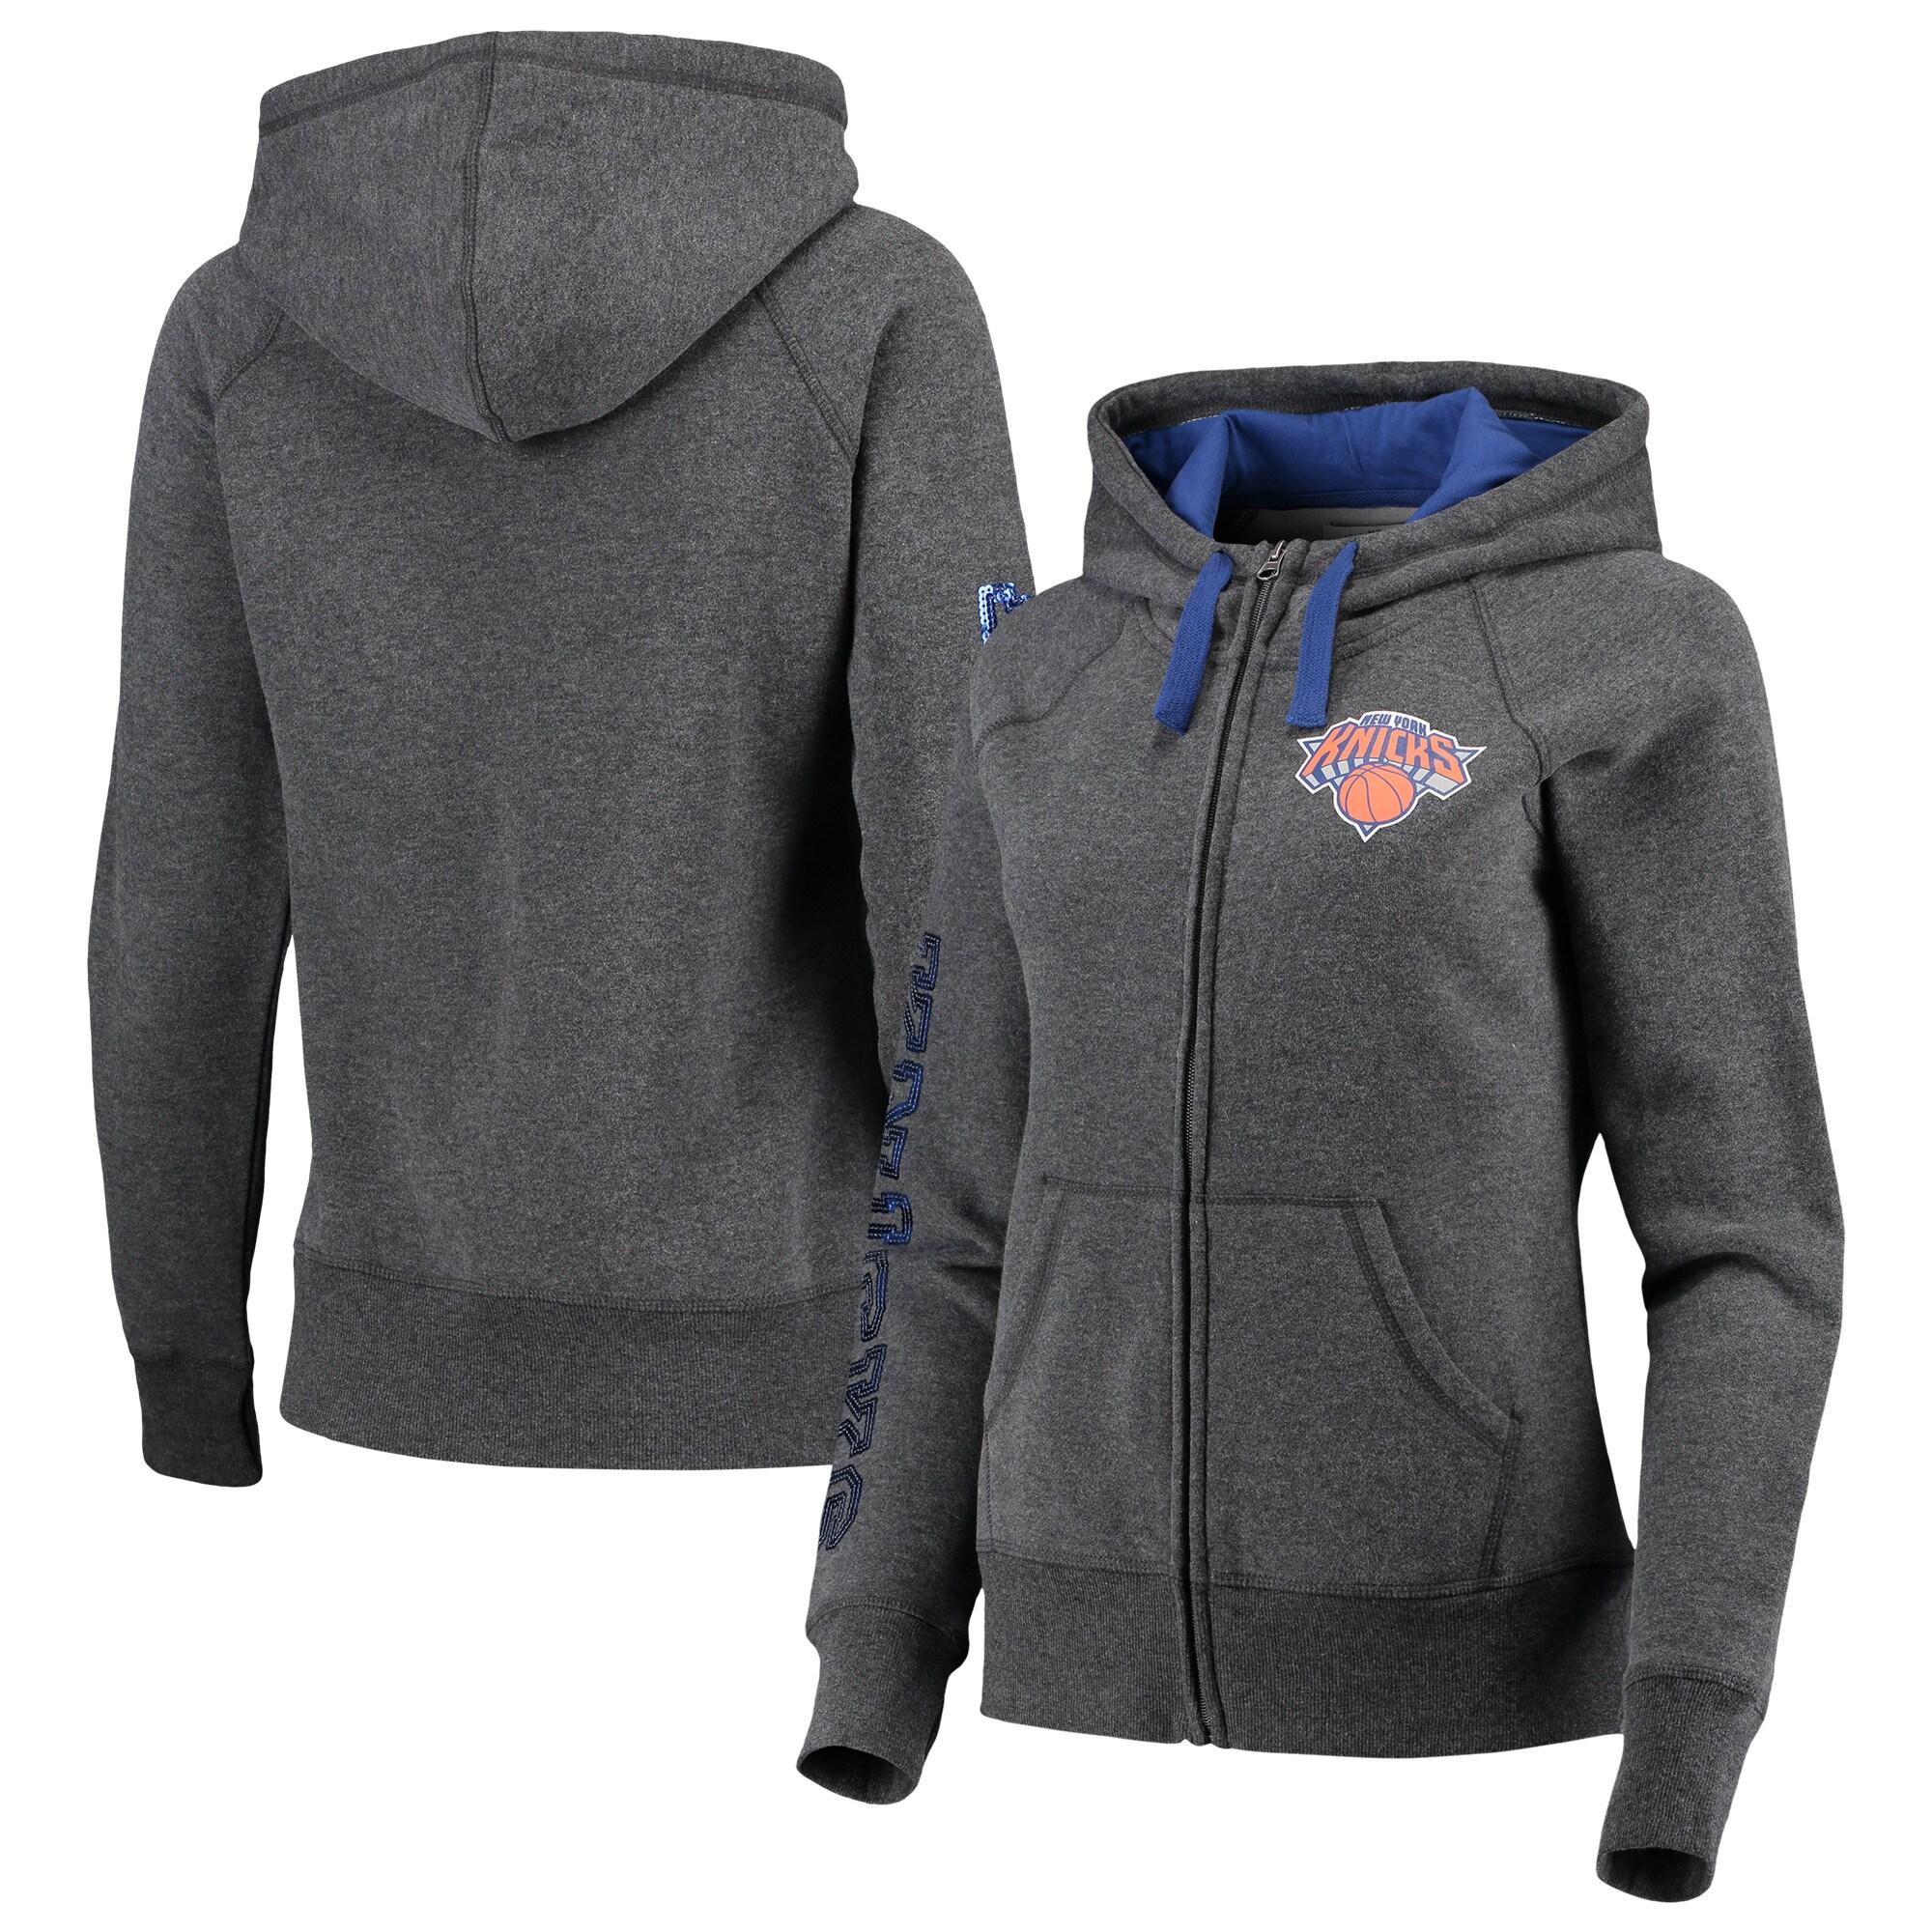 New York Knicks G-III 4Her by Carl Banks Women's Playoff Suede Fleece Full-Zip Jacket - Charcoal/Blue